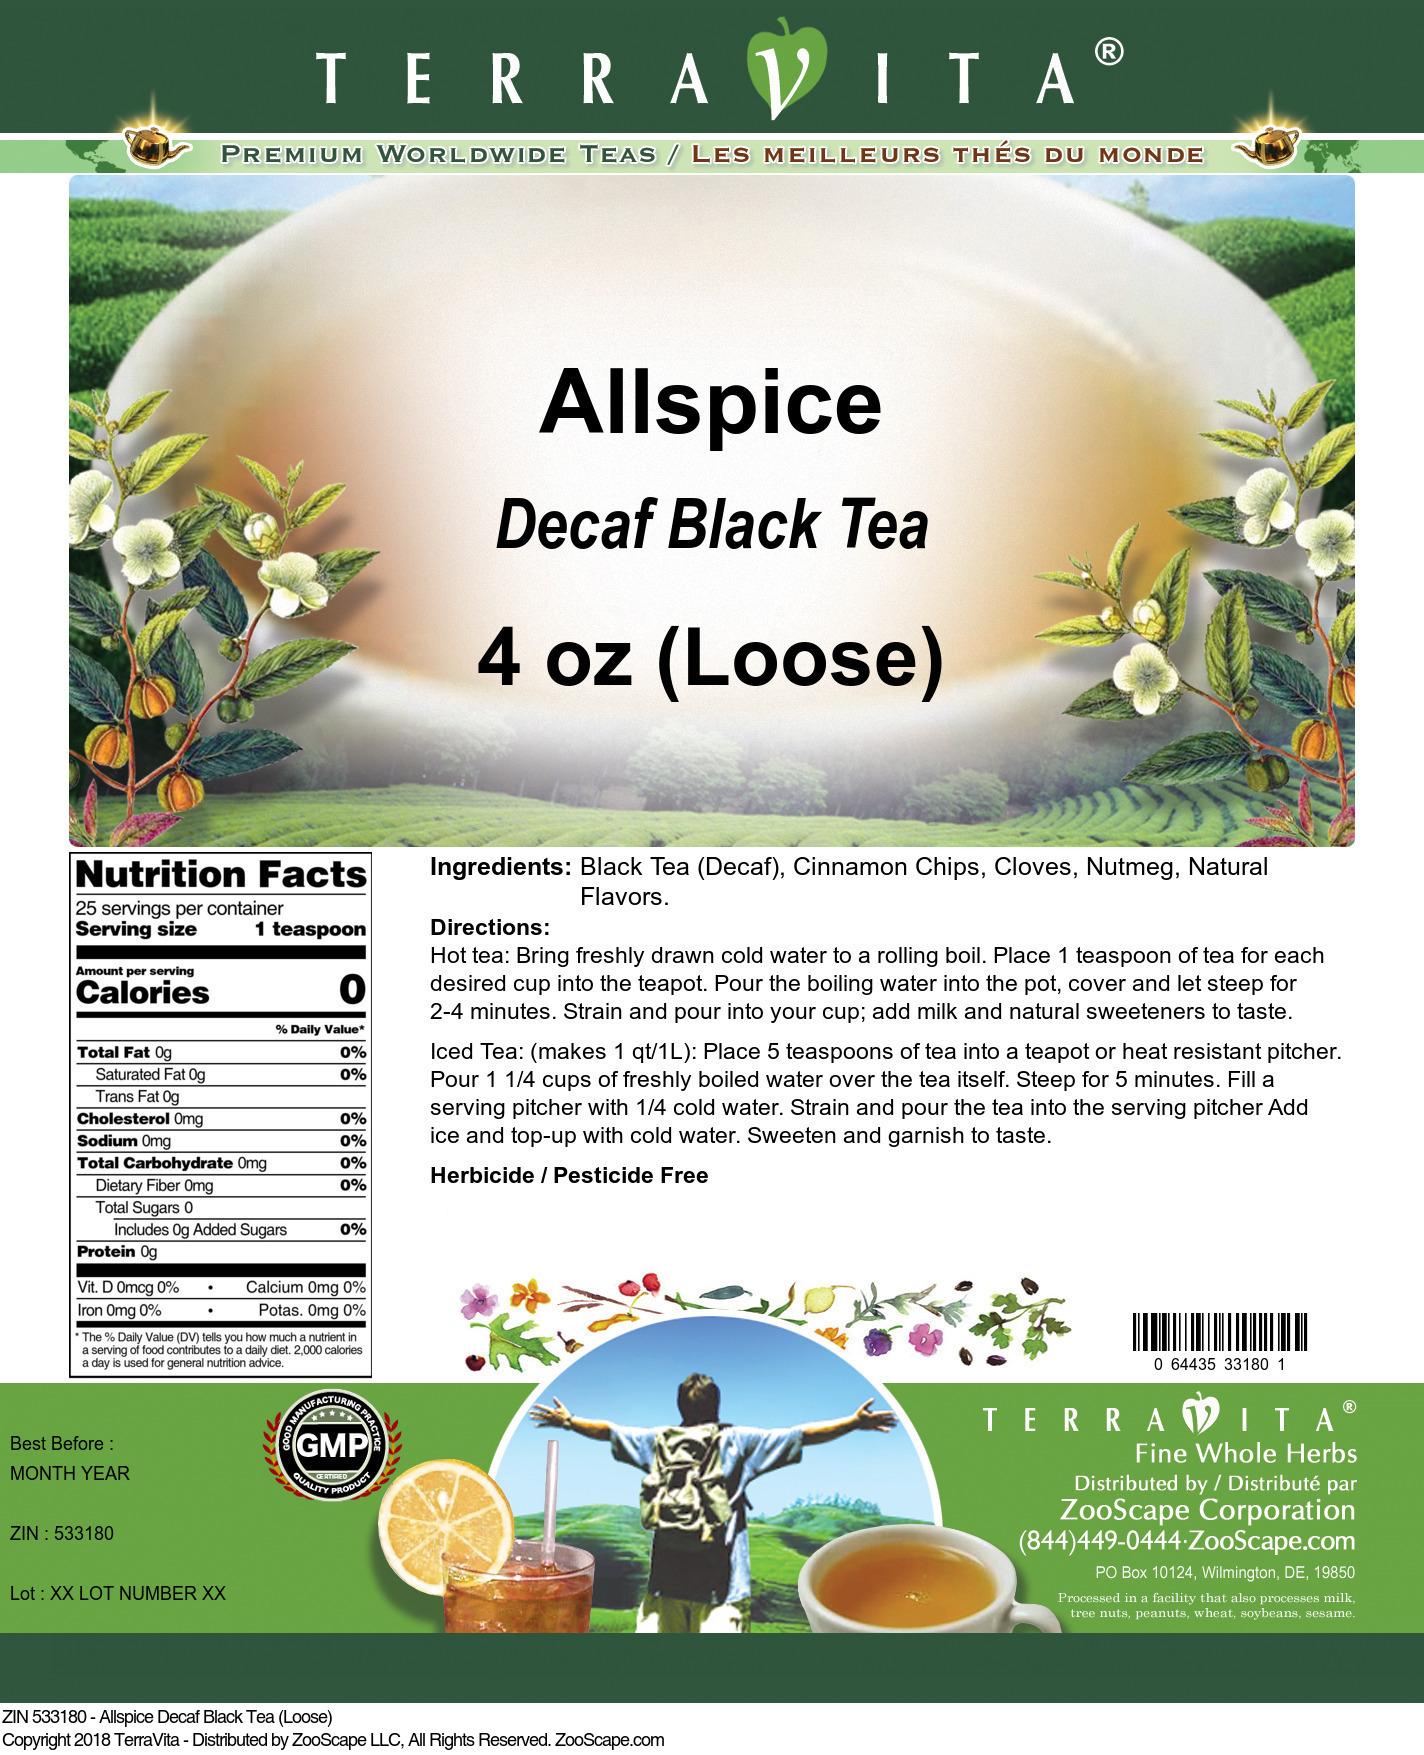 Allspice Decaf Black Tea (Loose)